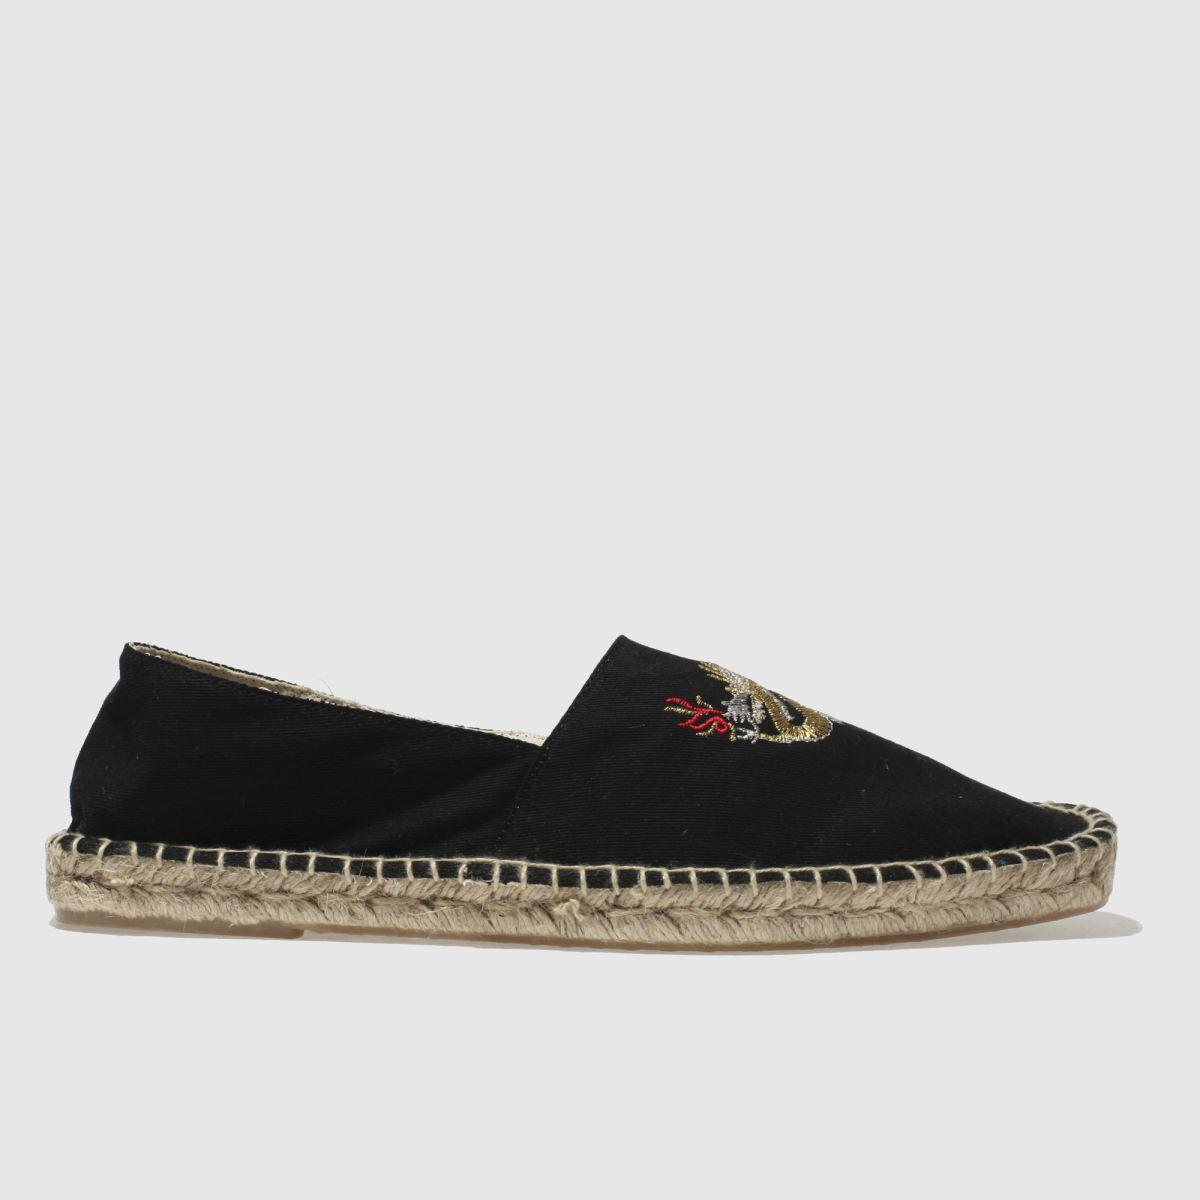 H by Hudson H By Hudson Black Blake Shoes